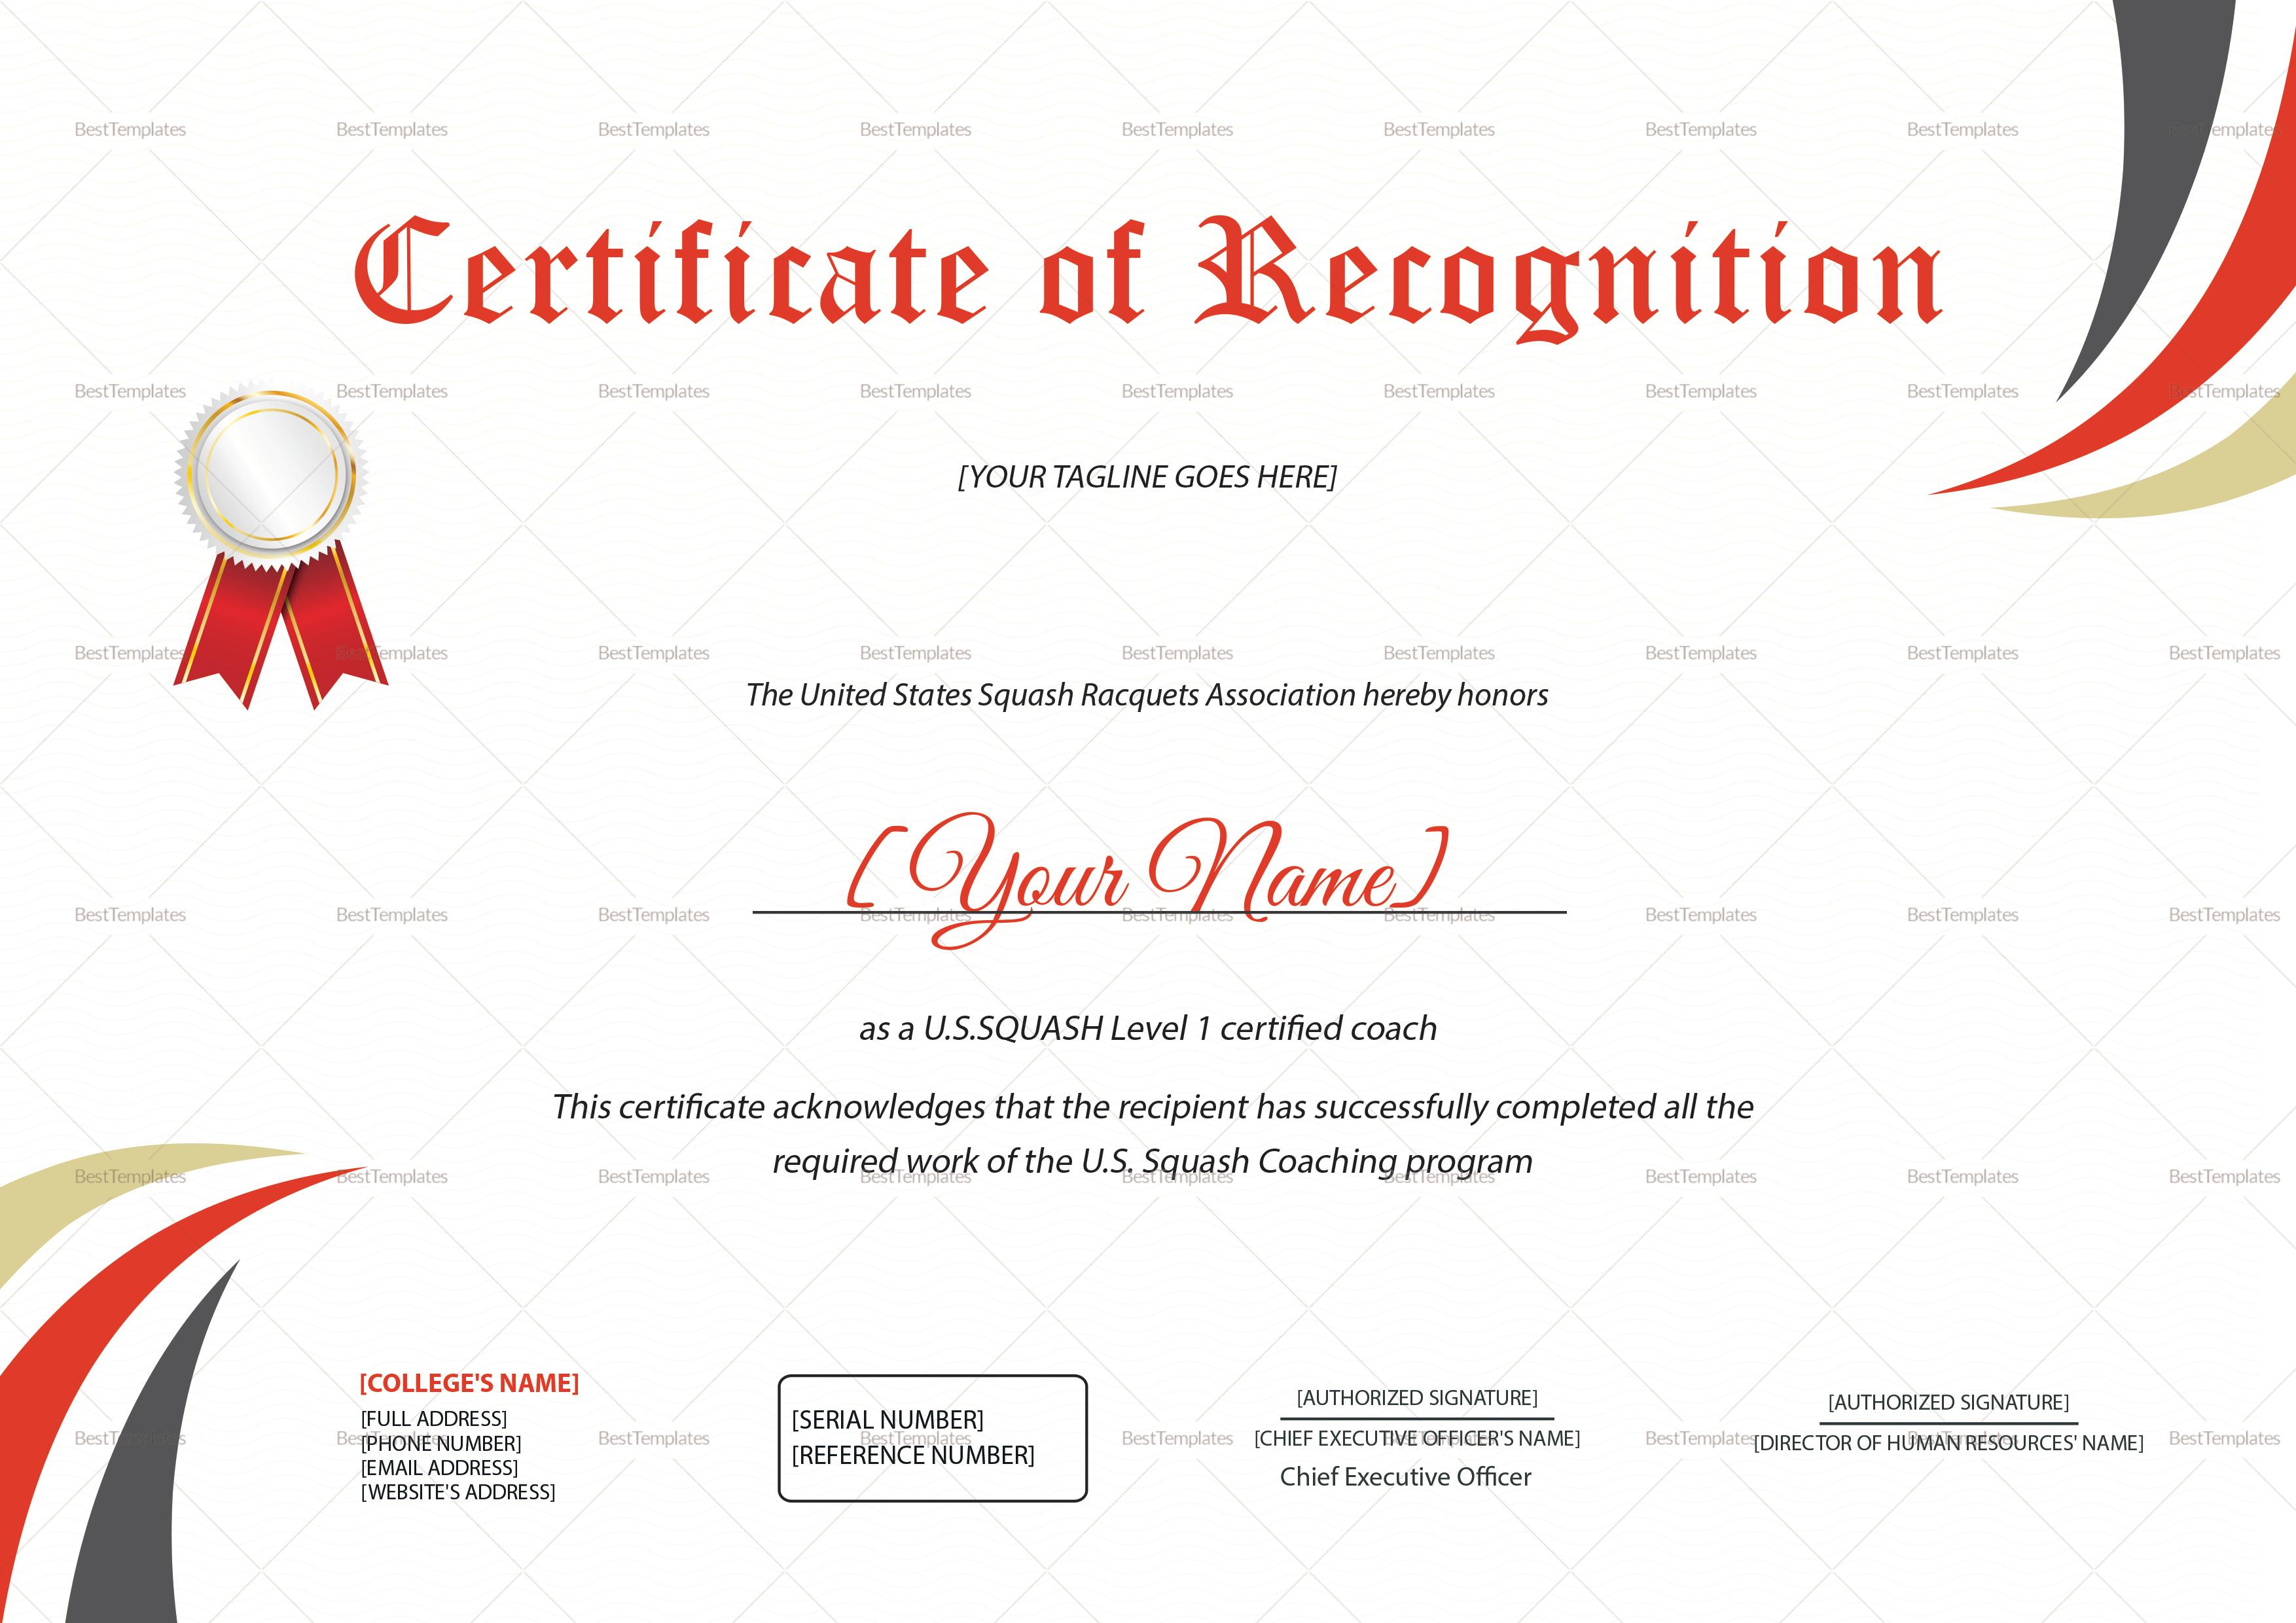 Squash Recognition Certificate Design Template